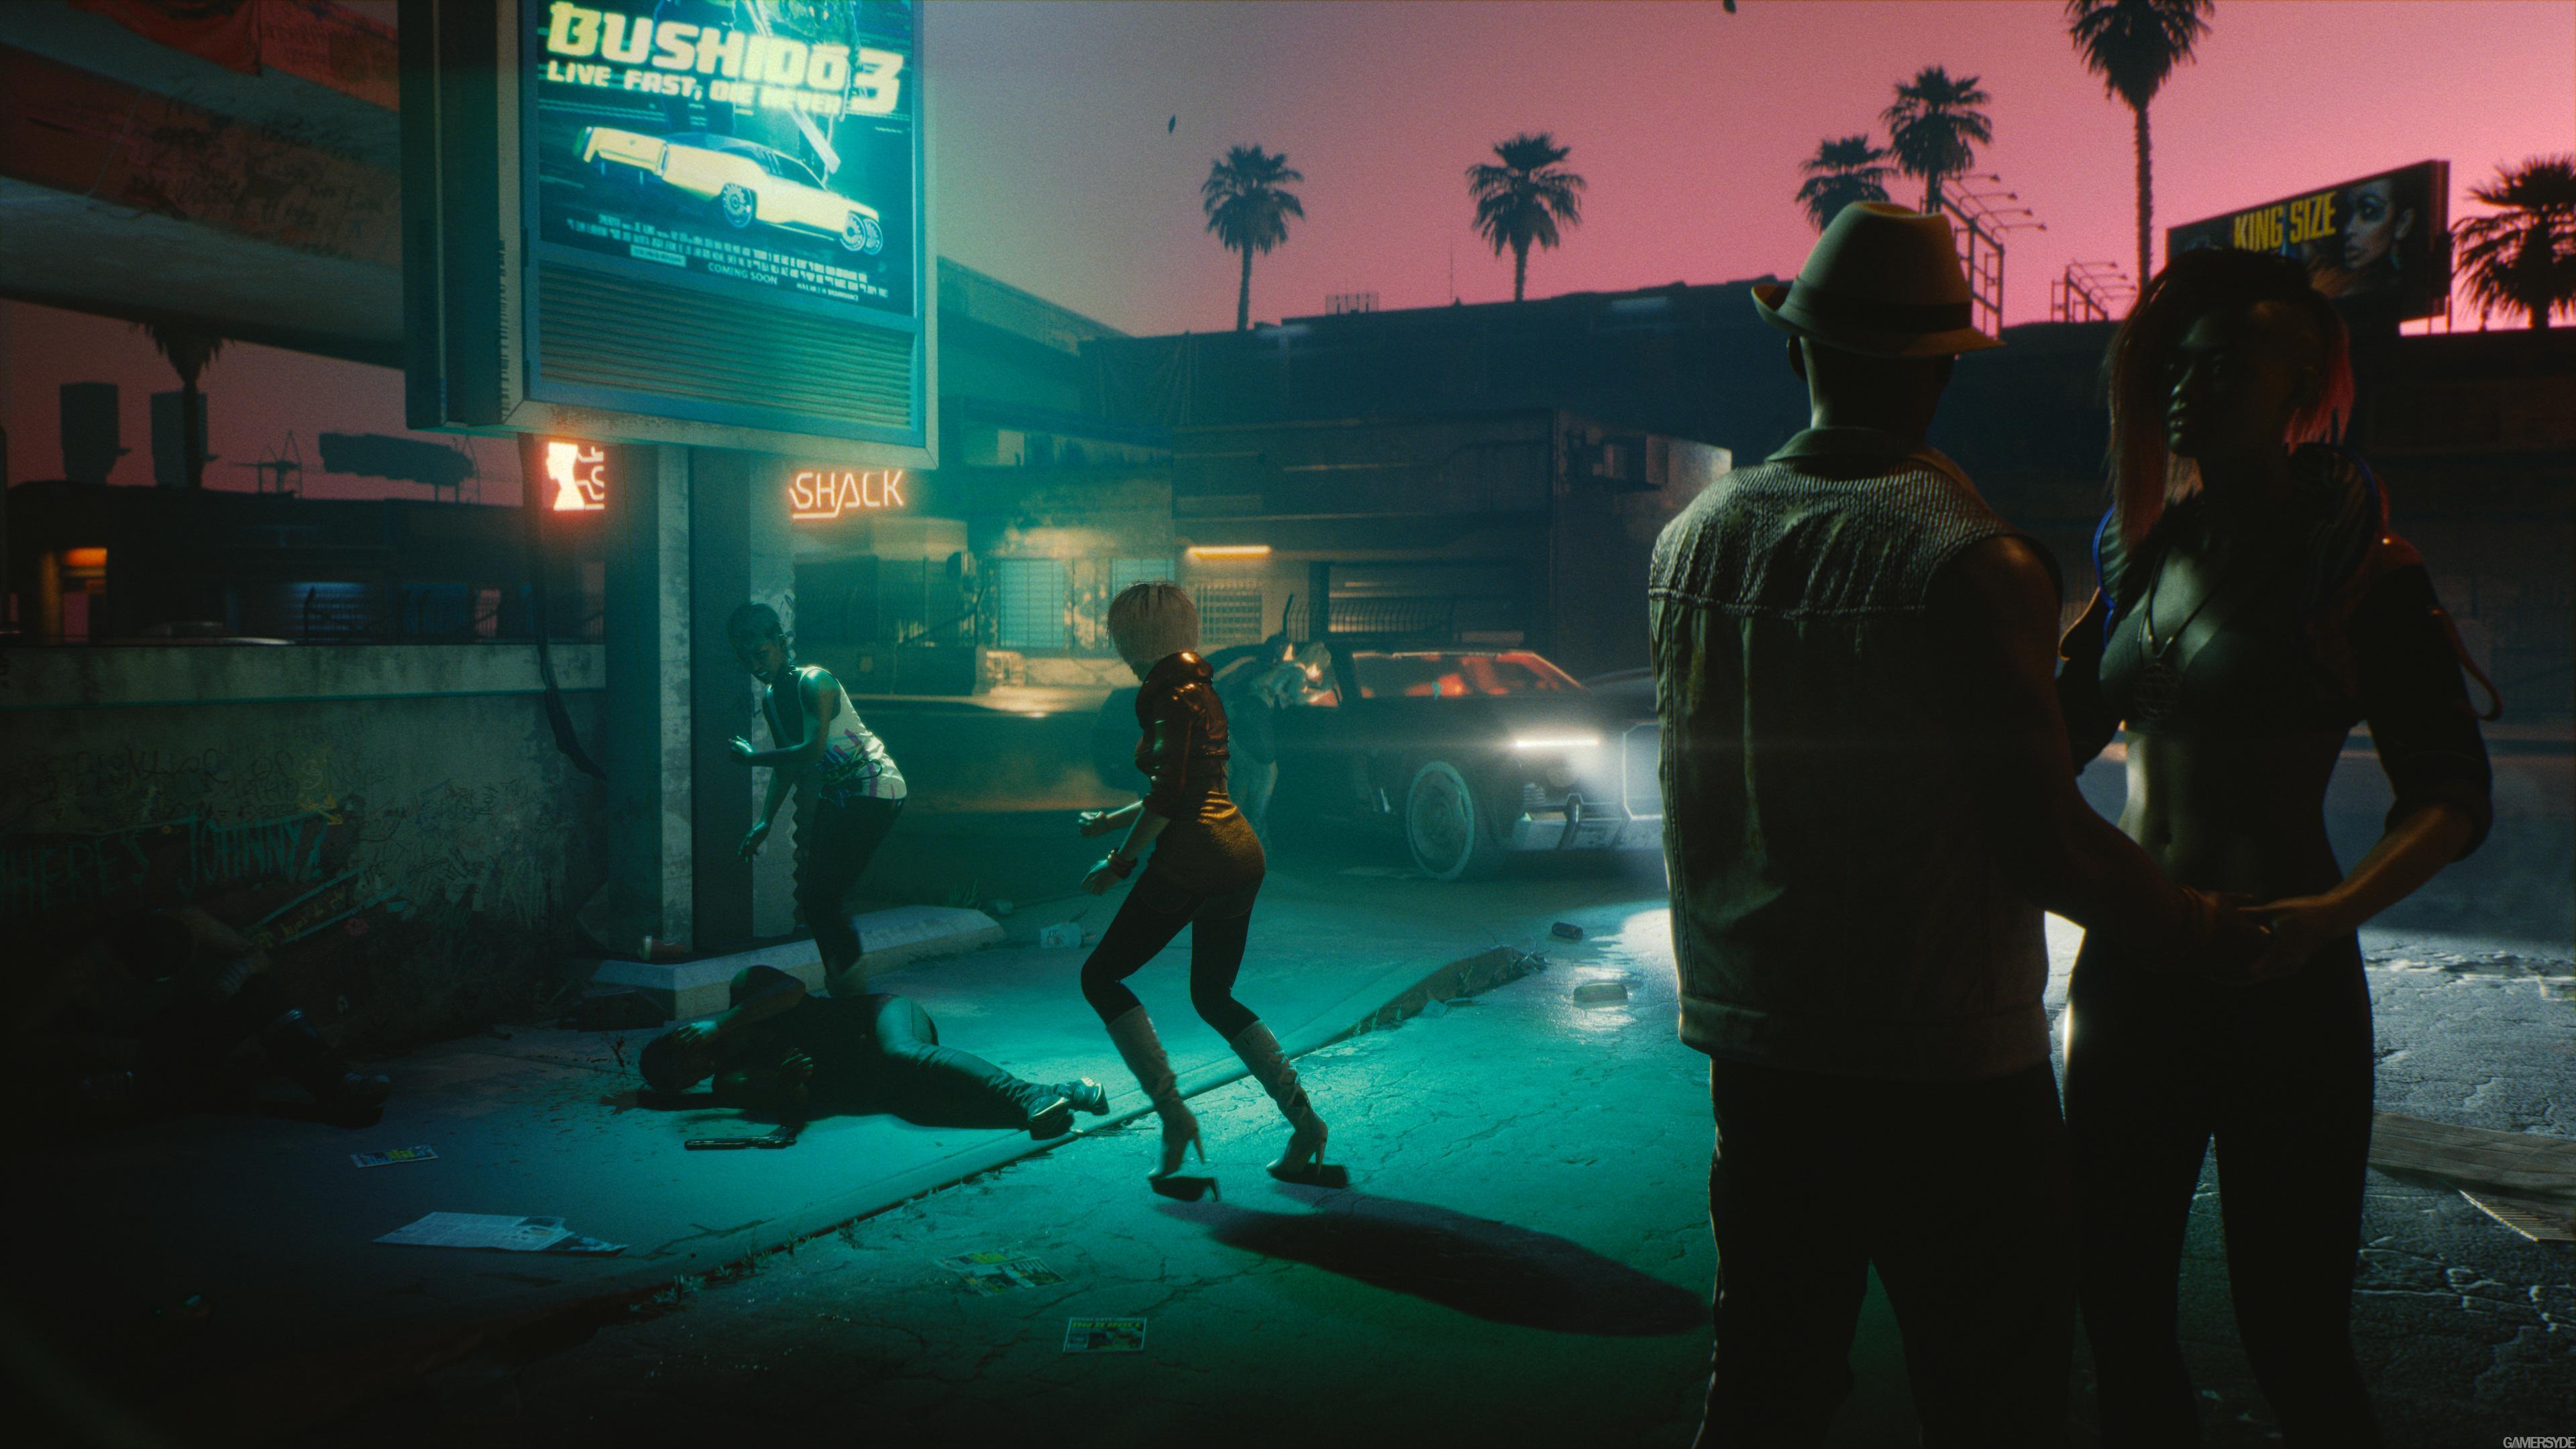 Eerie dark streets, reminiscent of the original Blade Runner movie